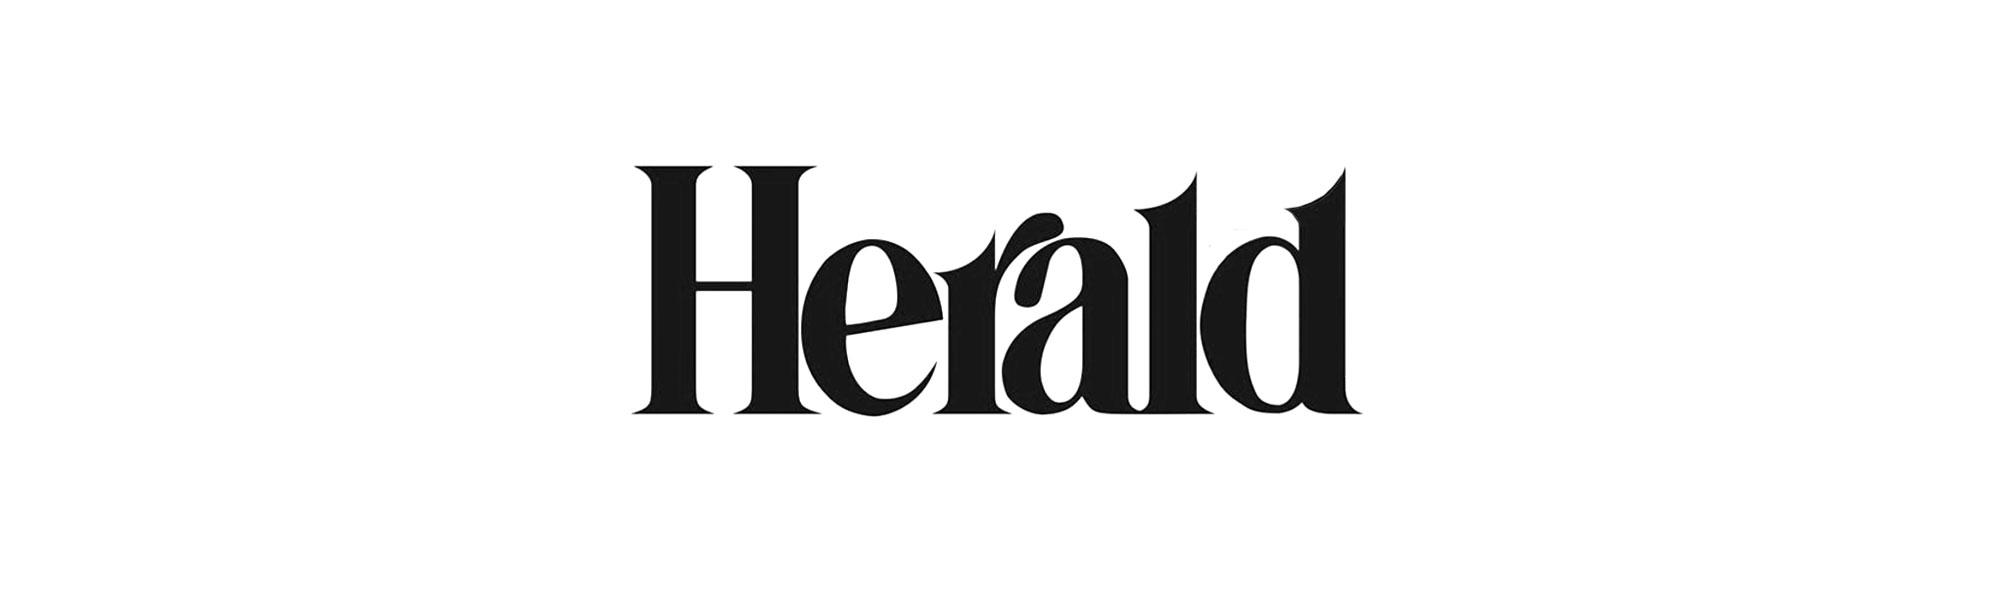 Herald Magazine …more (PDF)